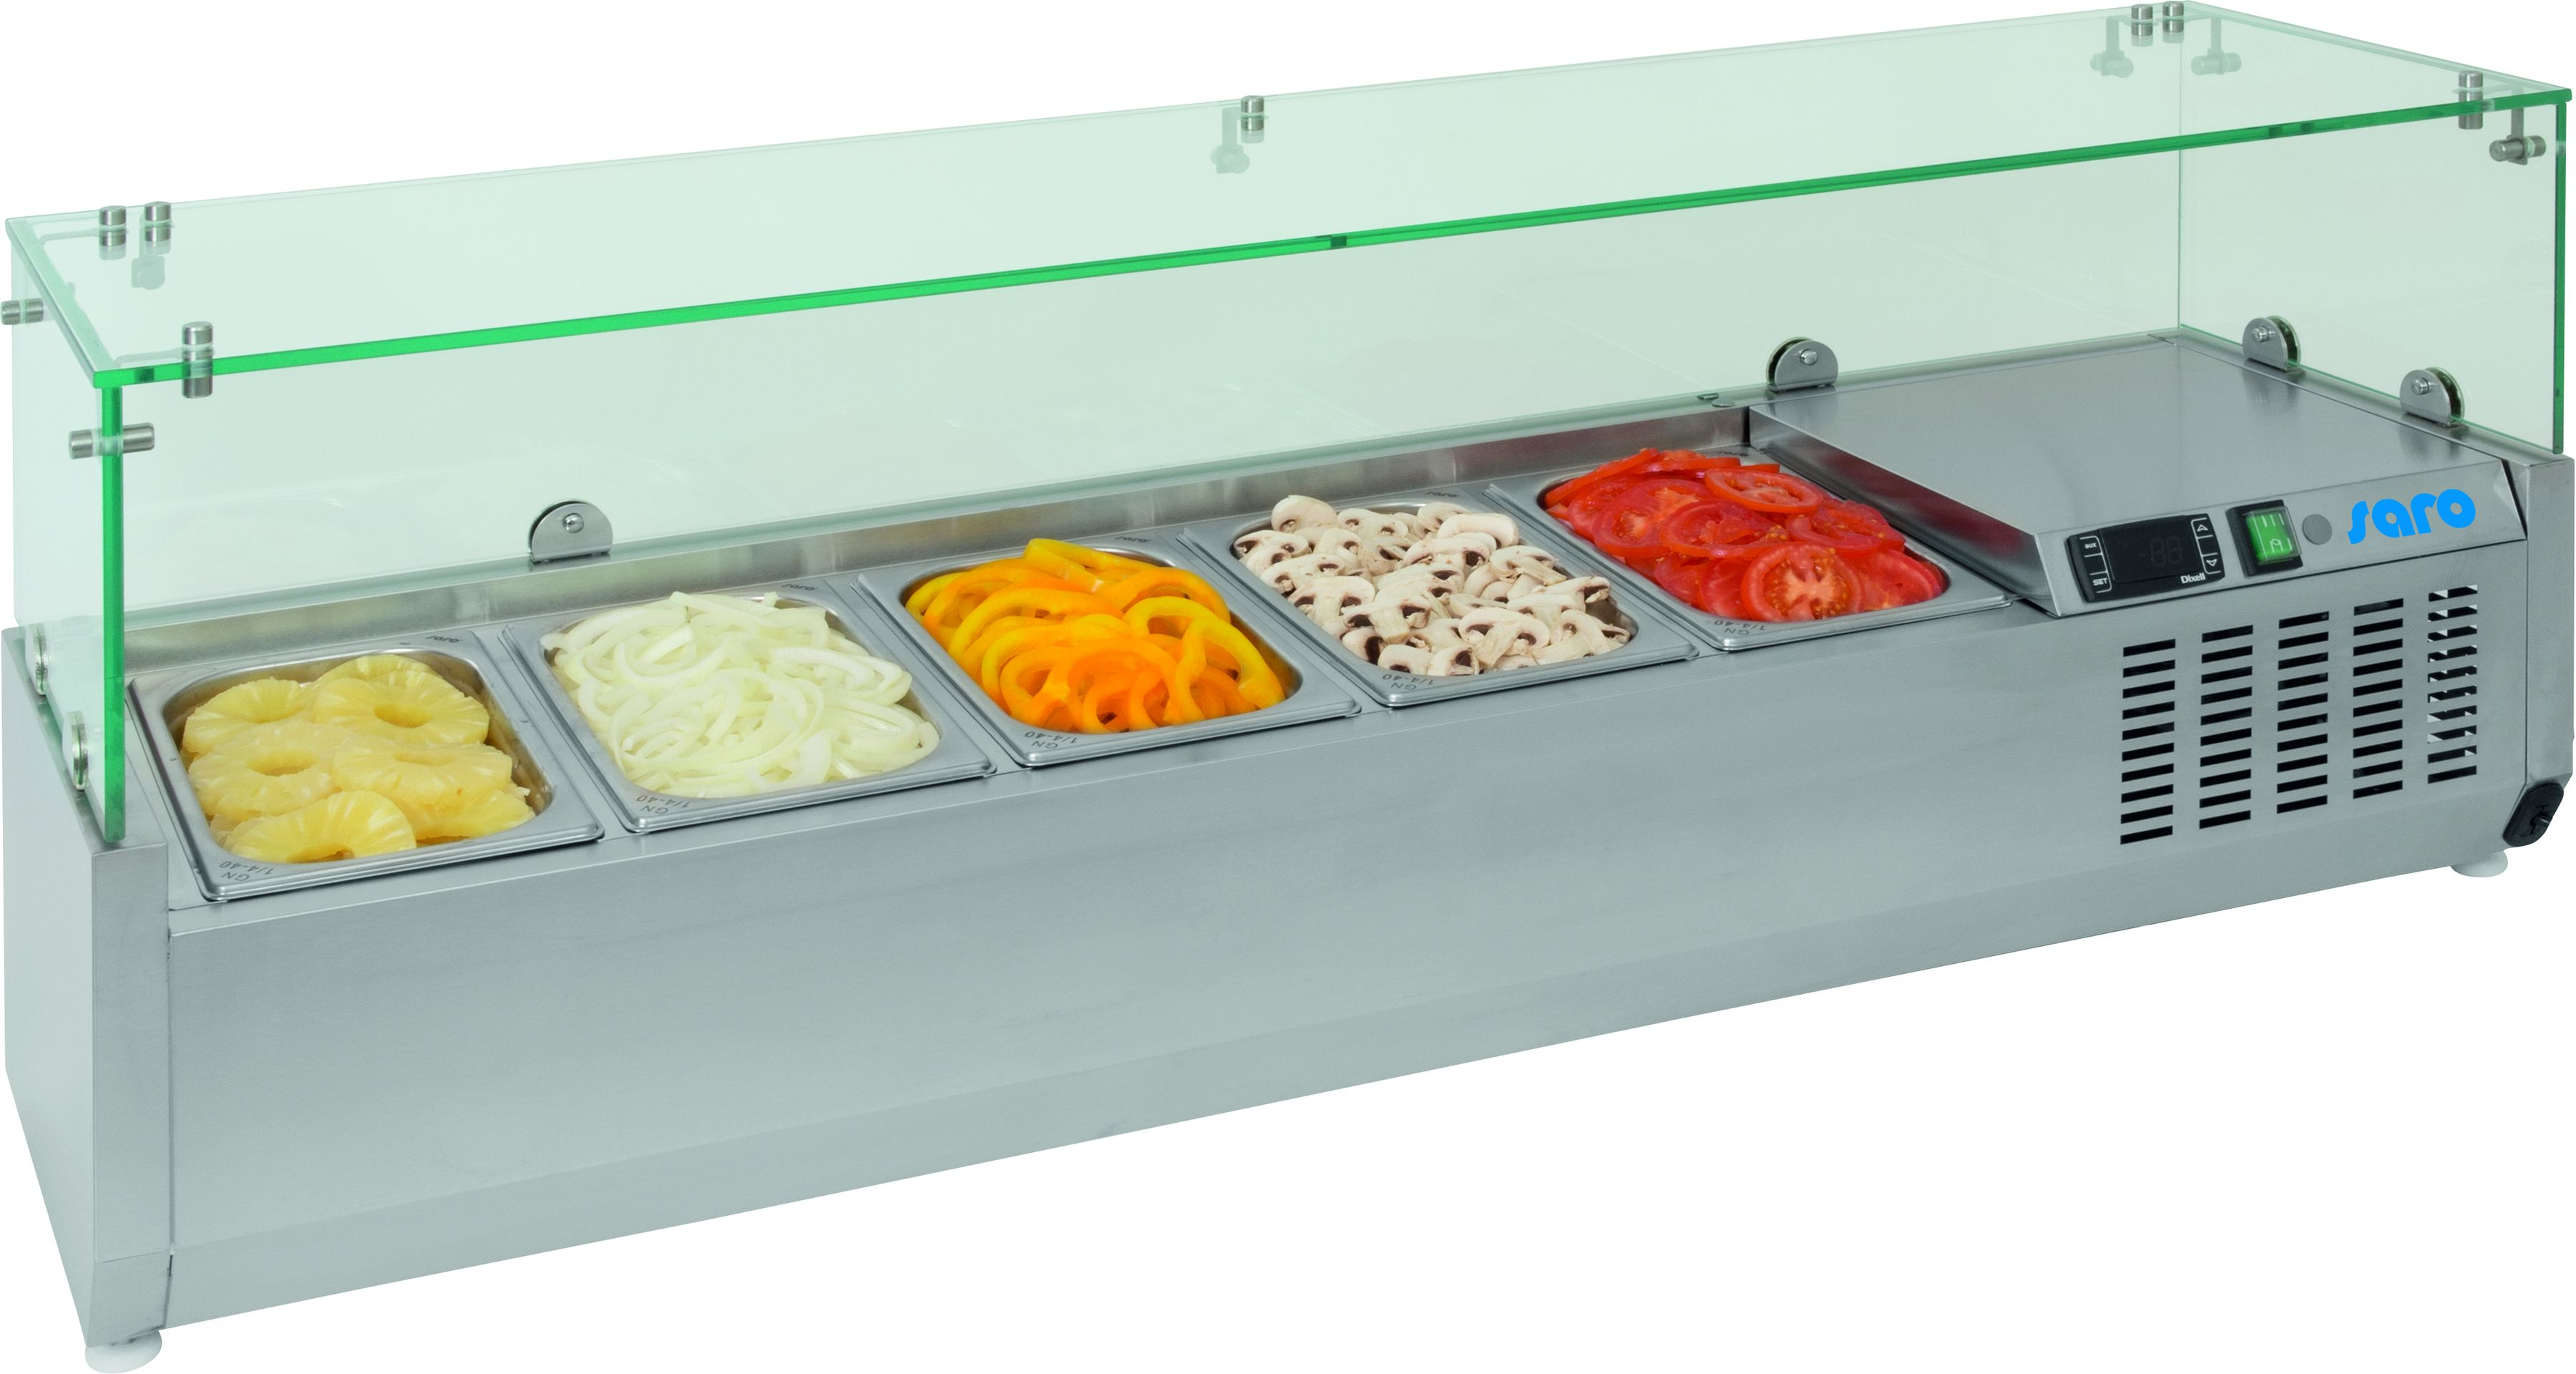 Refrigerated Table Top Display VRX 1800/330 | Saro